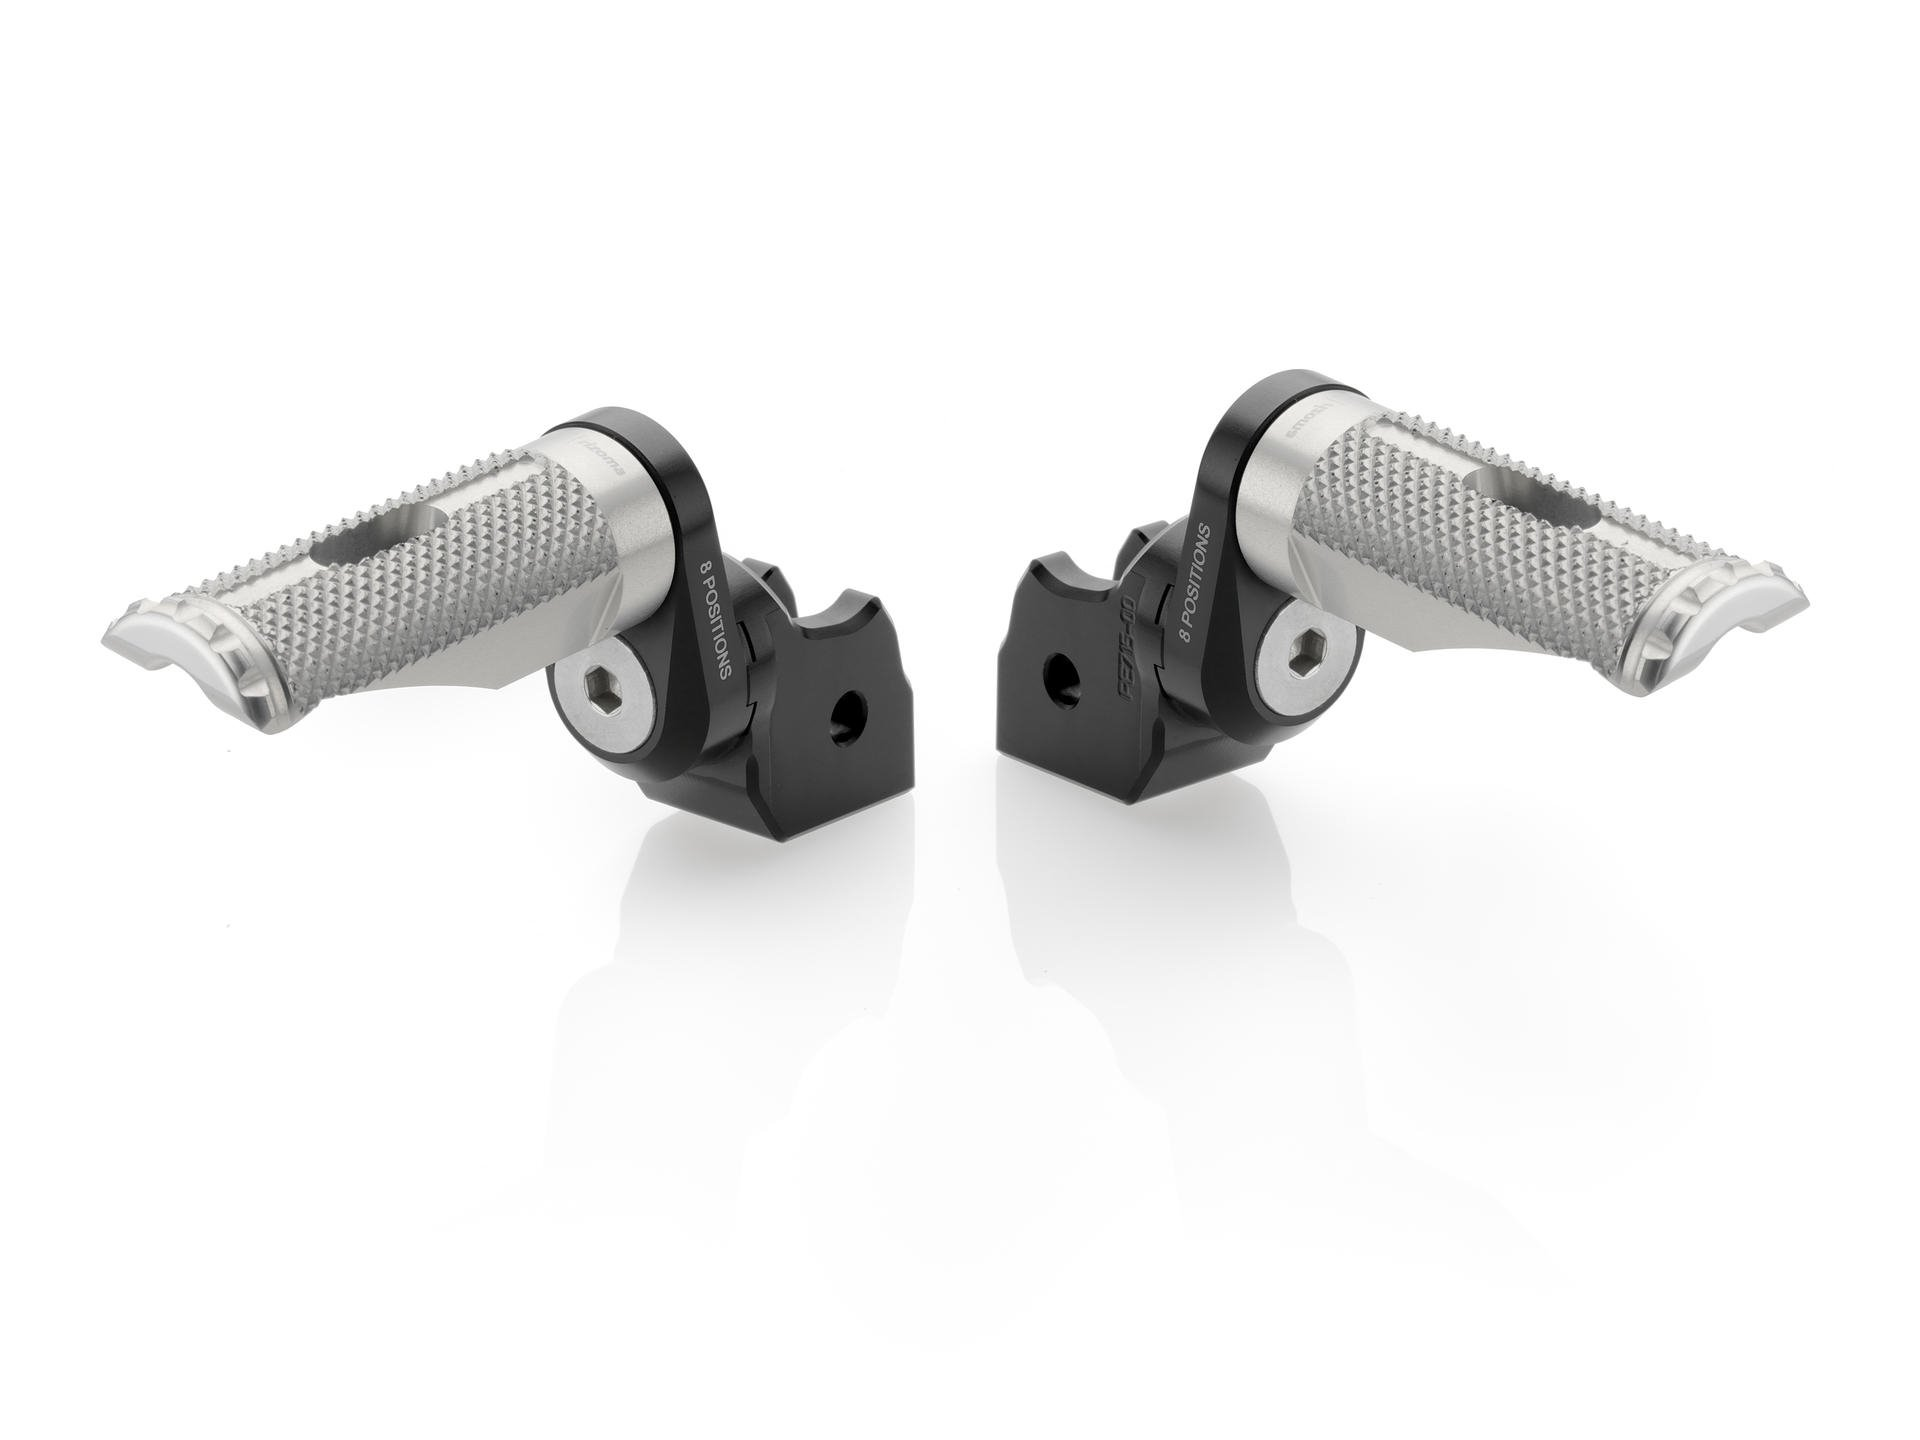 Адаптеры передних подножек Rizoma для Ducati Hypermotard 821 SP 14-15, Scrambler 15-16, Monster 821 15-16, Monster 1200 15-16, Multistrada 1200 15-16